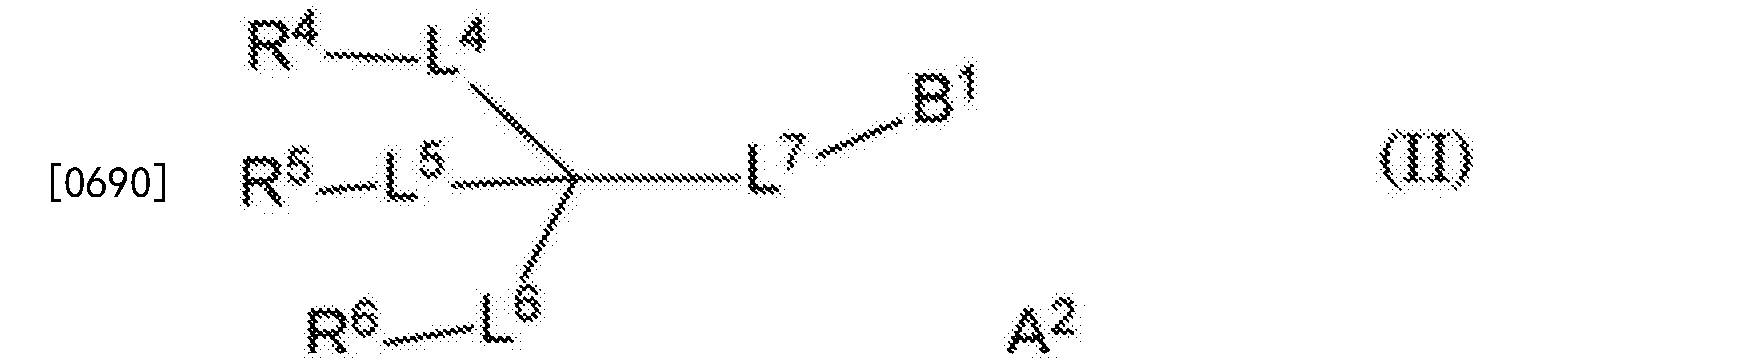 Figure CN107427531AD00861